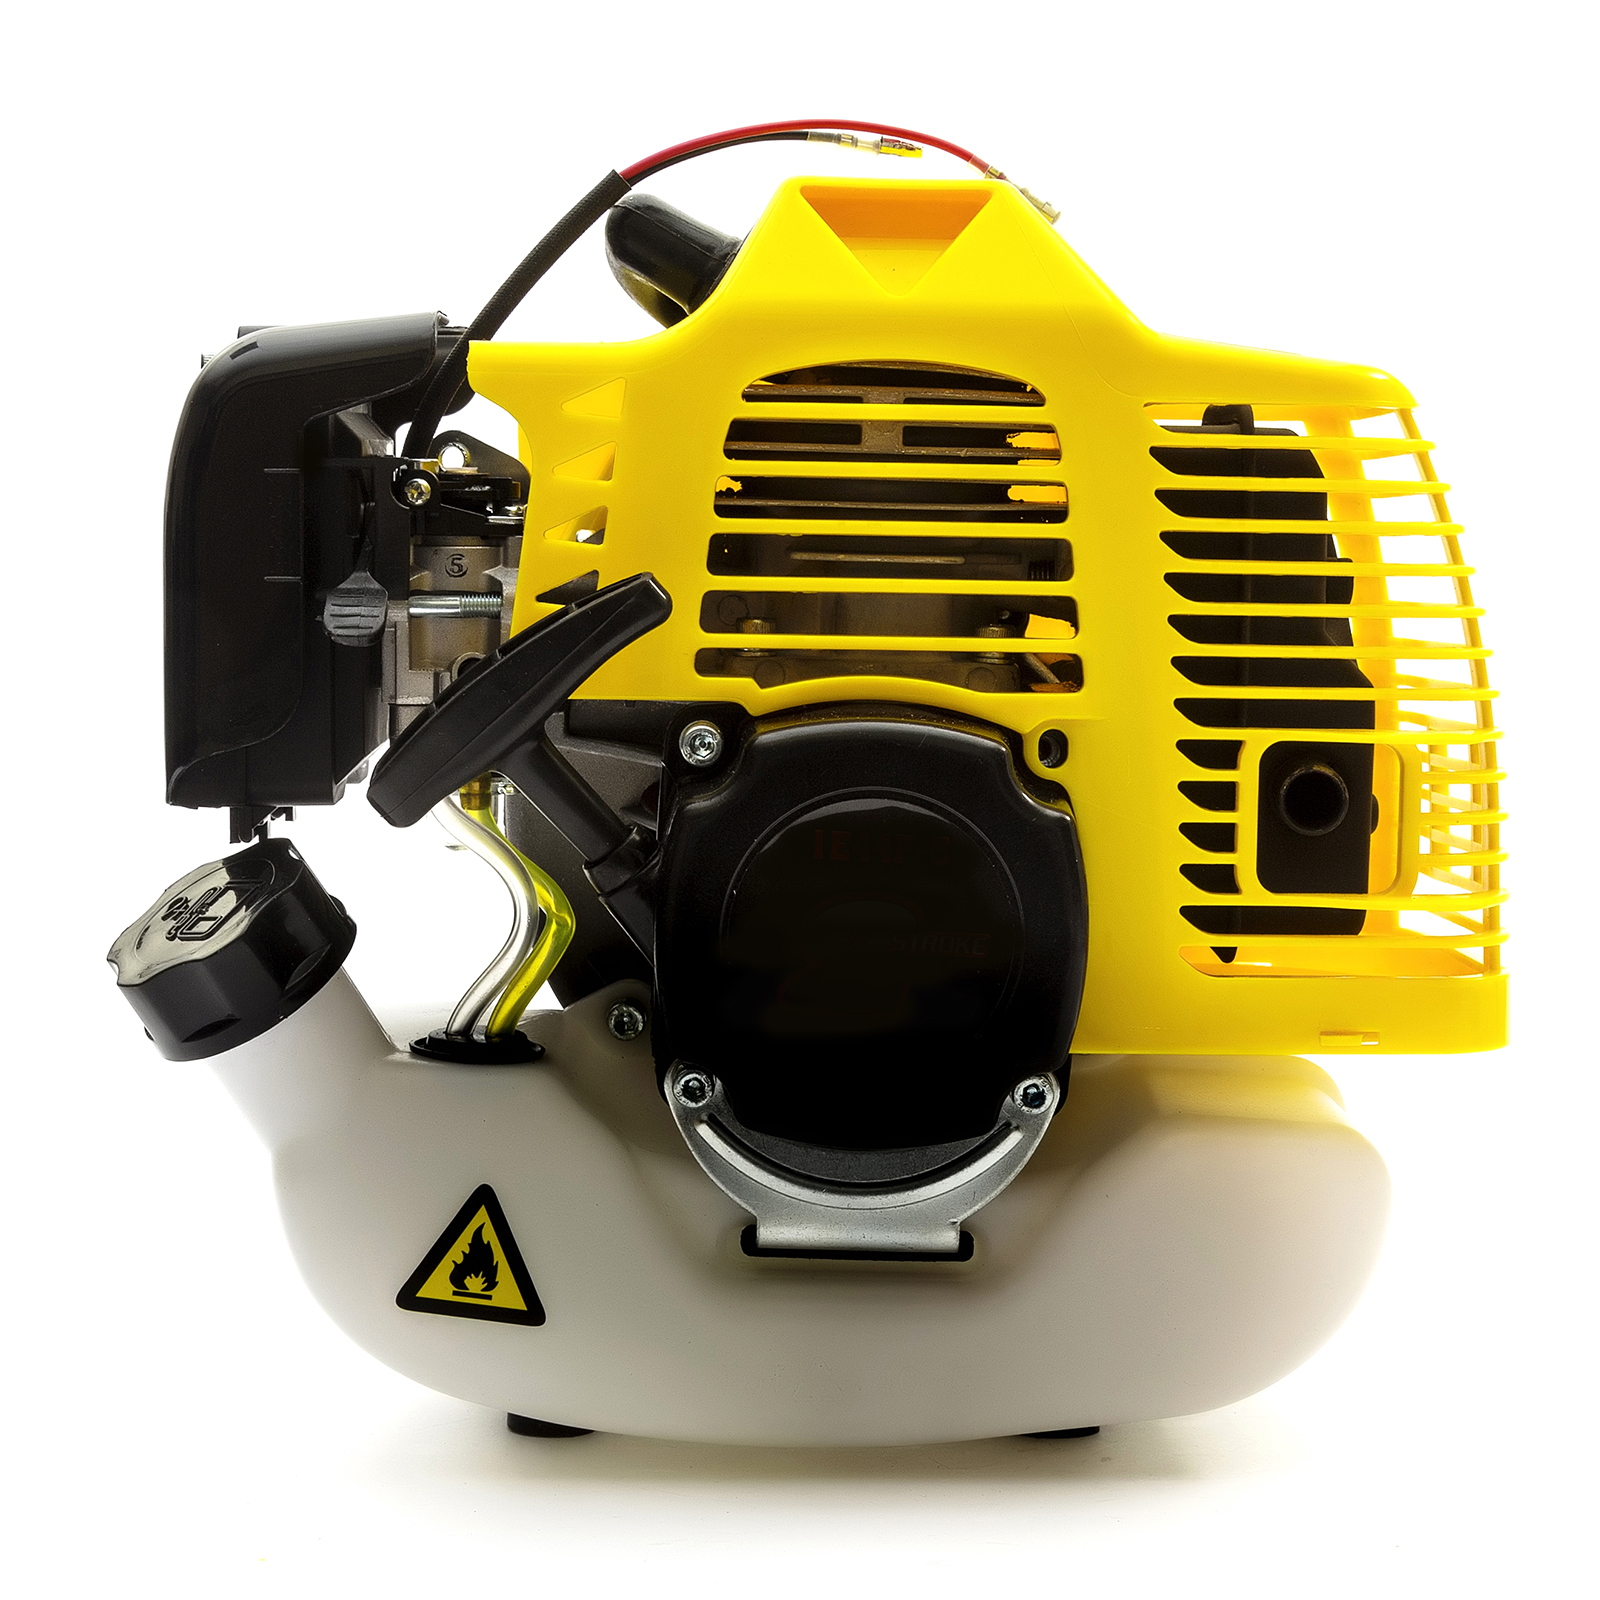 Chinese 49cc 52cc 55cc Multitool Brush Cutter Strimmer 2 Shoe 2T Clutch Polesaw